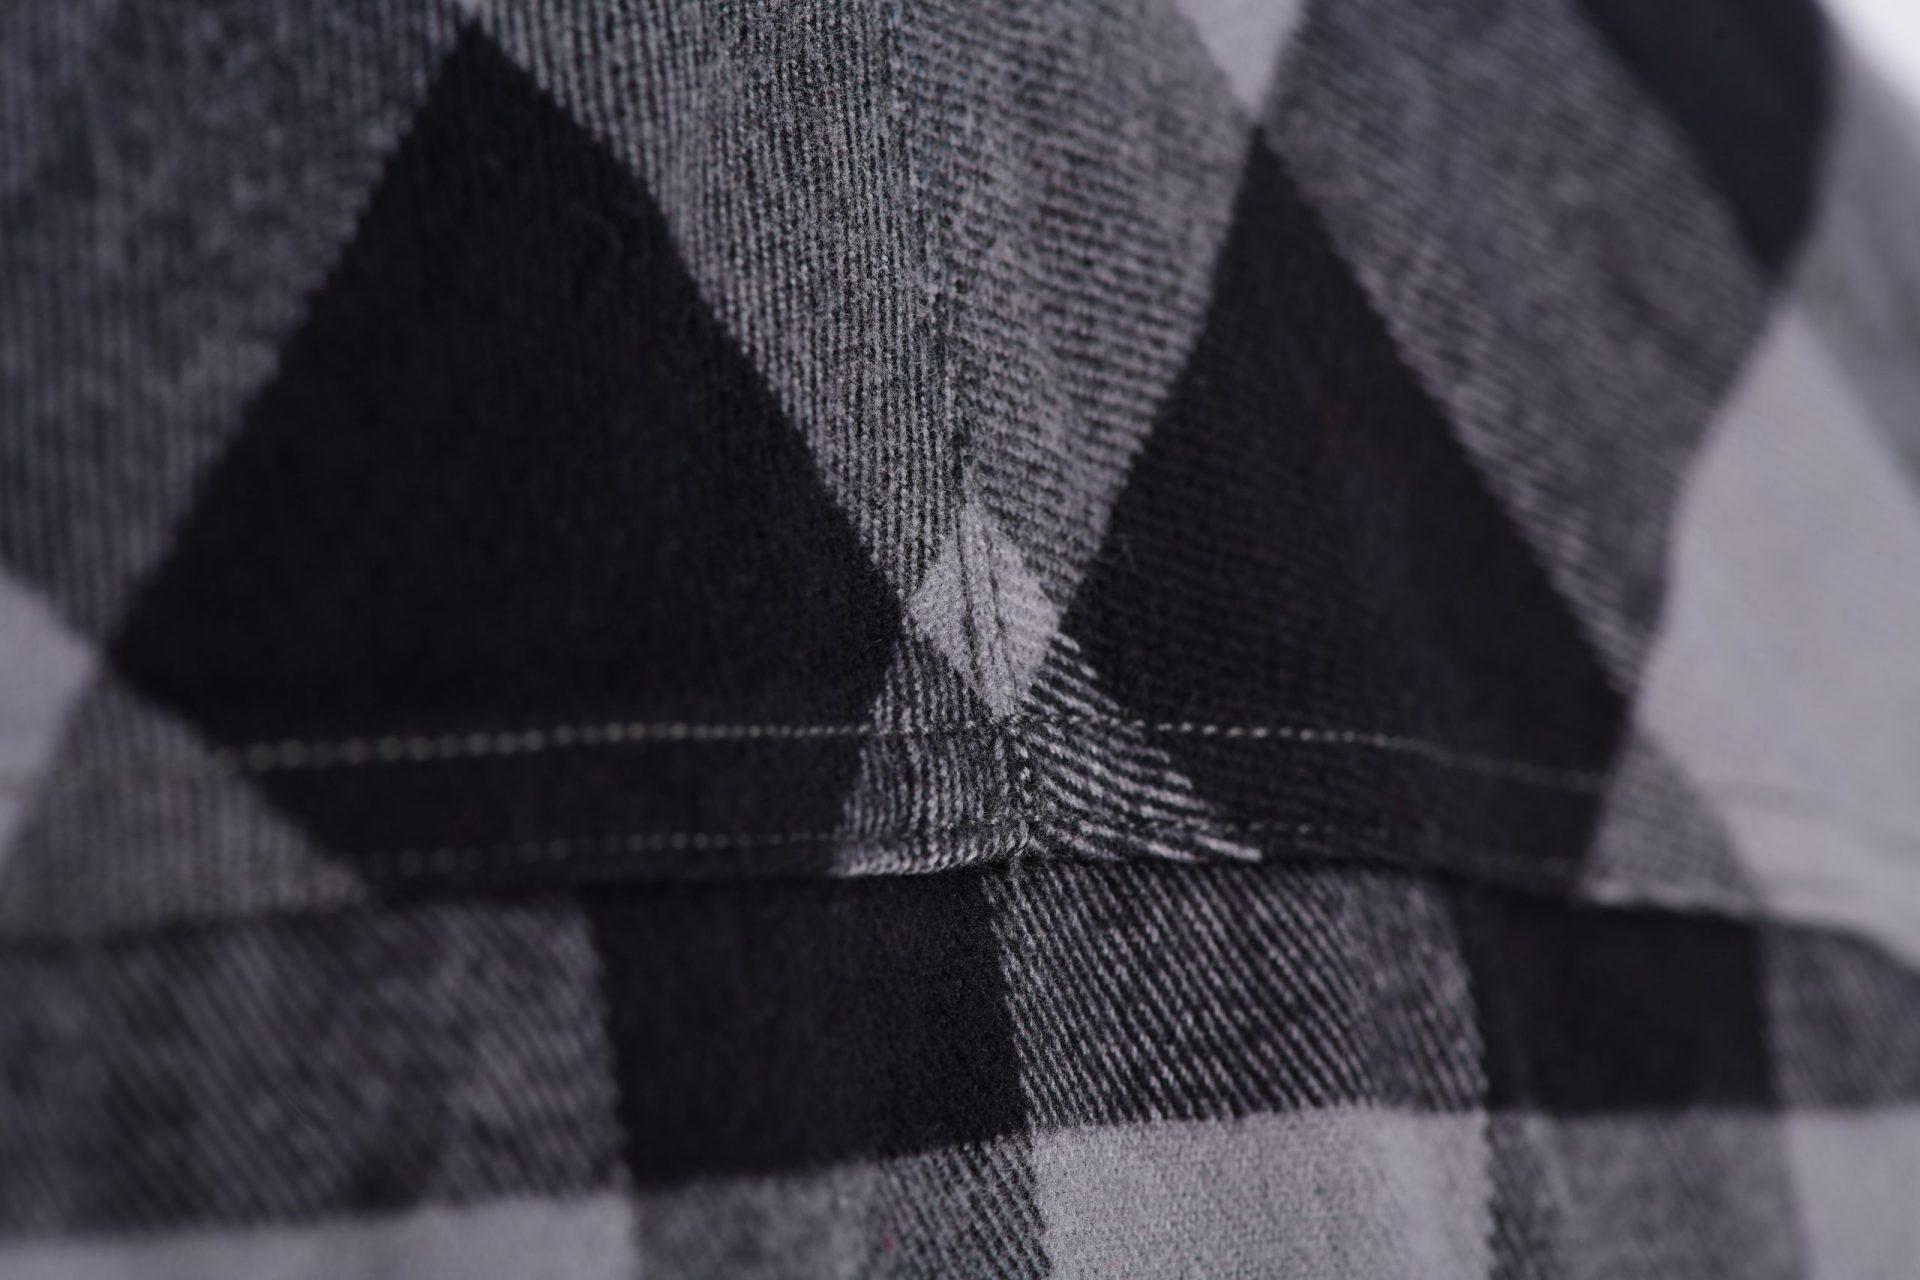 Kickback_Macro_1-scaled Kickback 2.0 Shirt